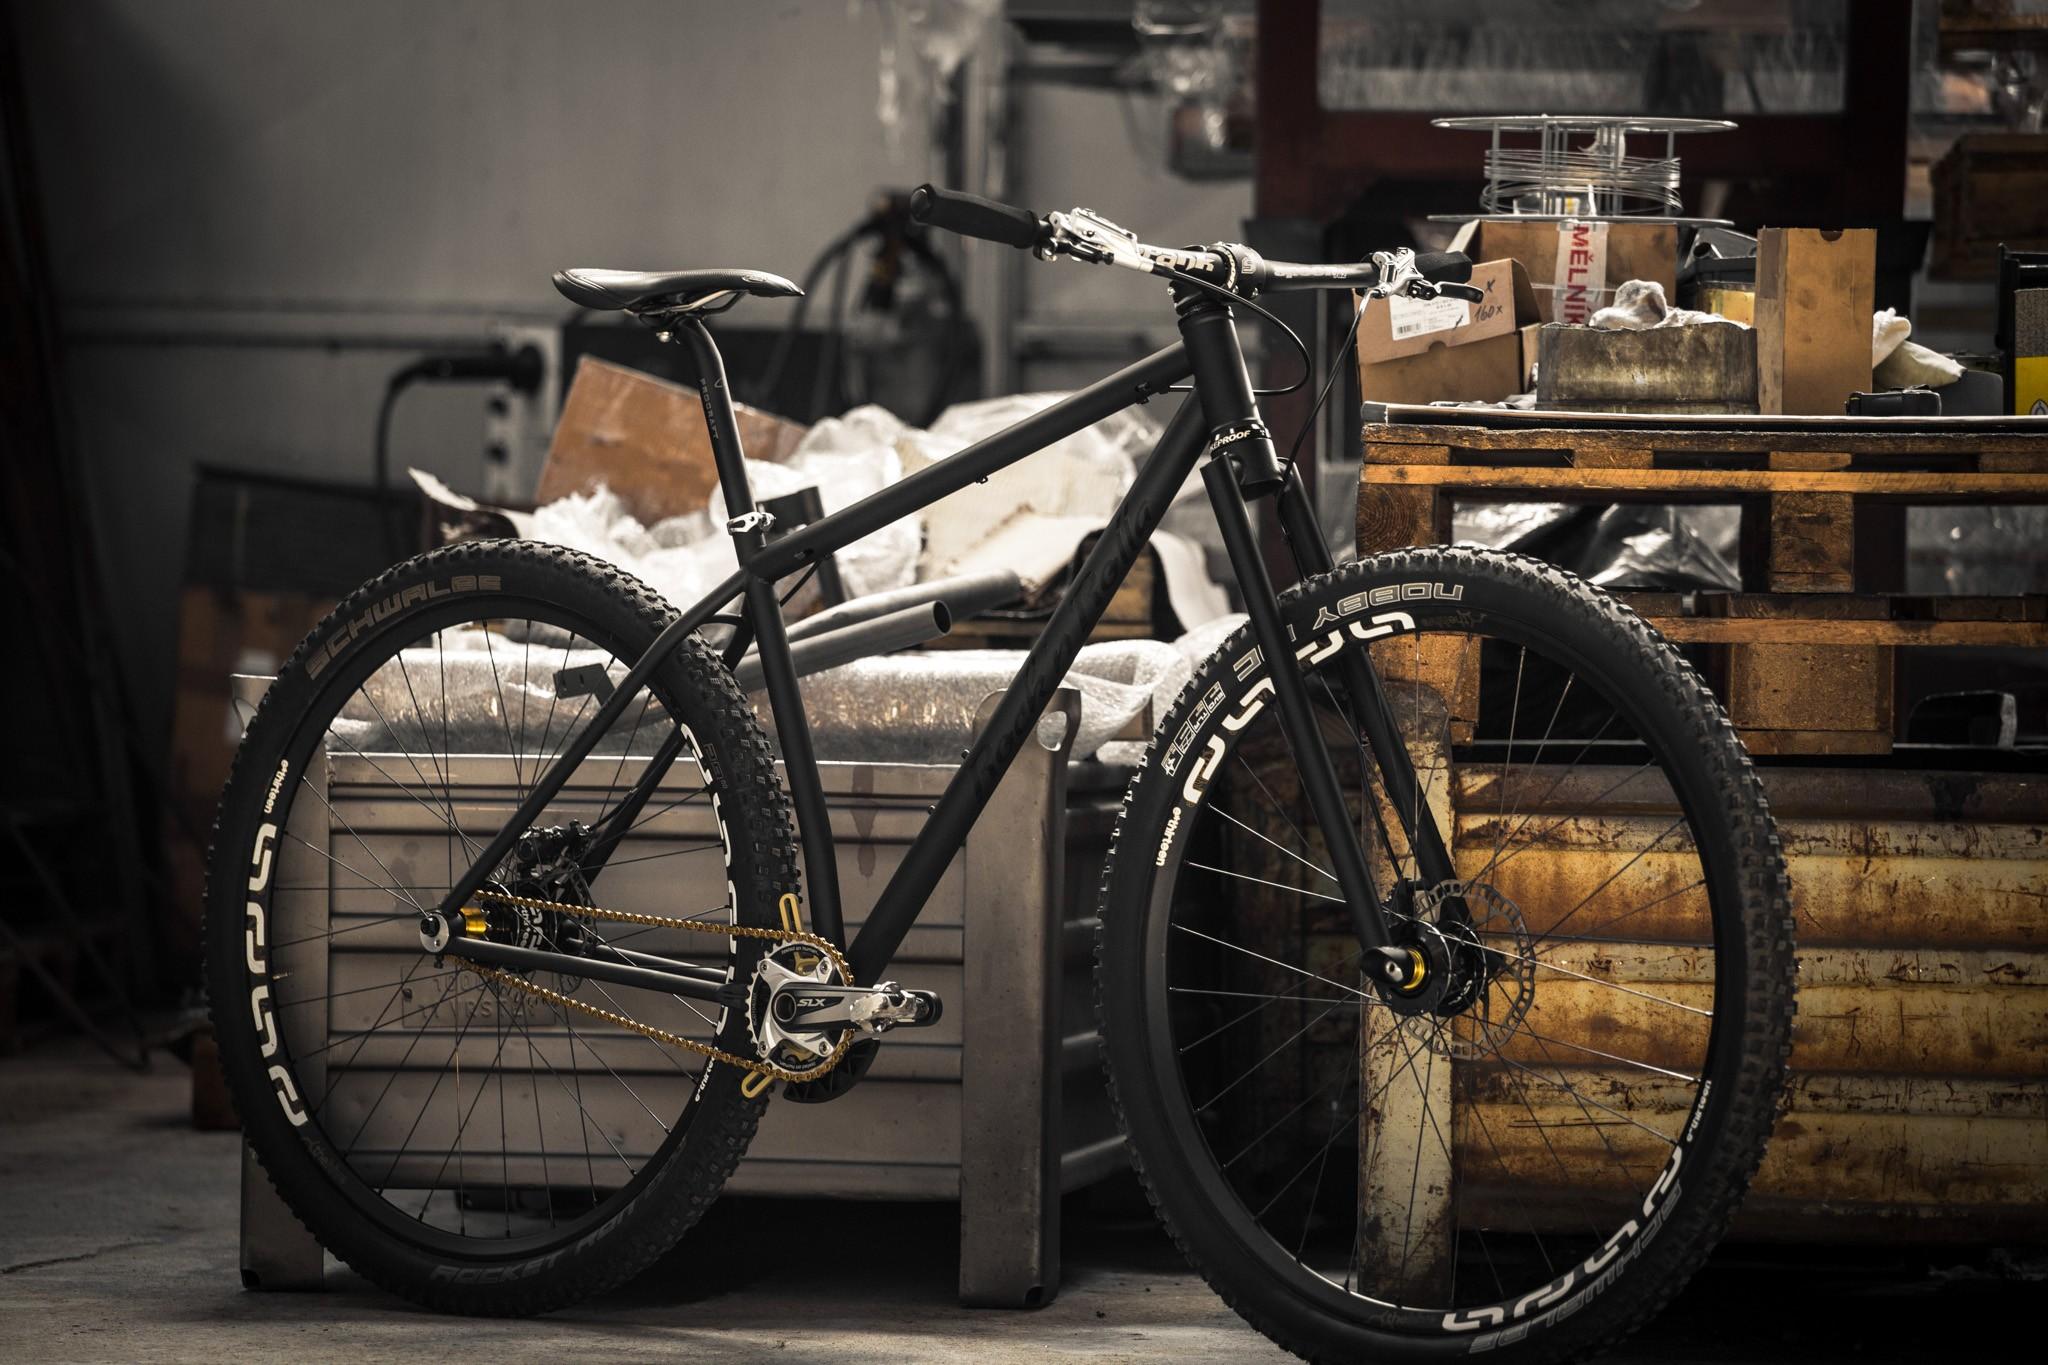 singlebe_bikes_rocknrolla_singlespeed_custom_frames_steel_twentininer_01